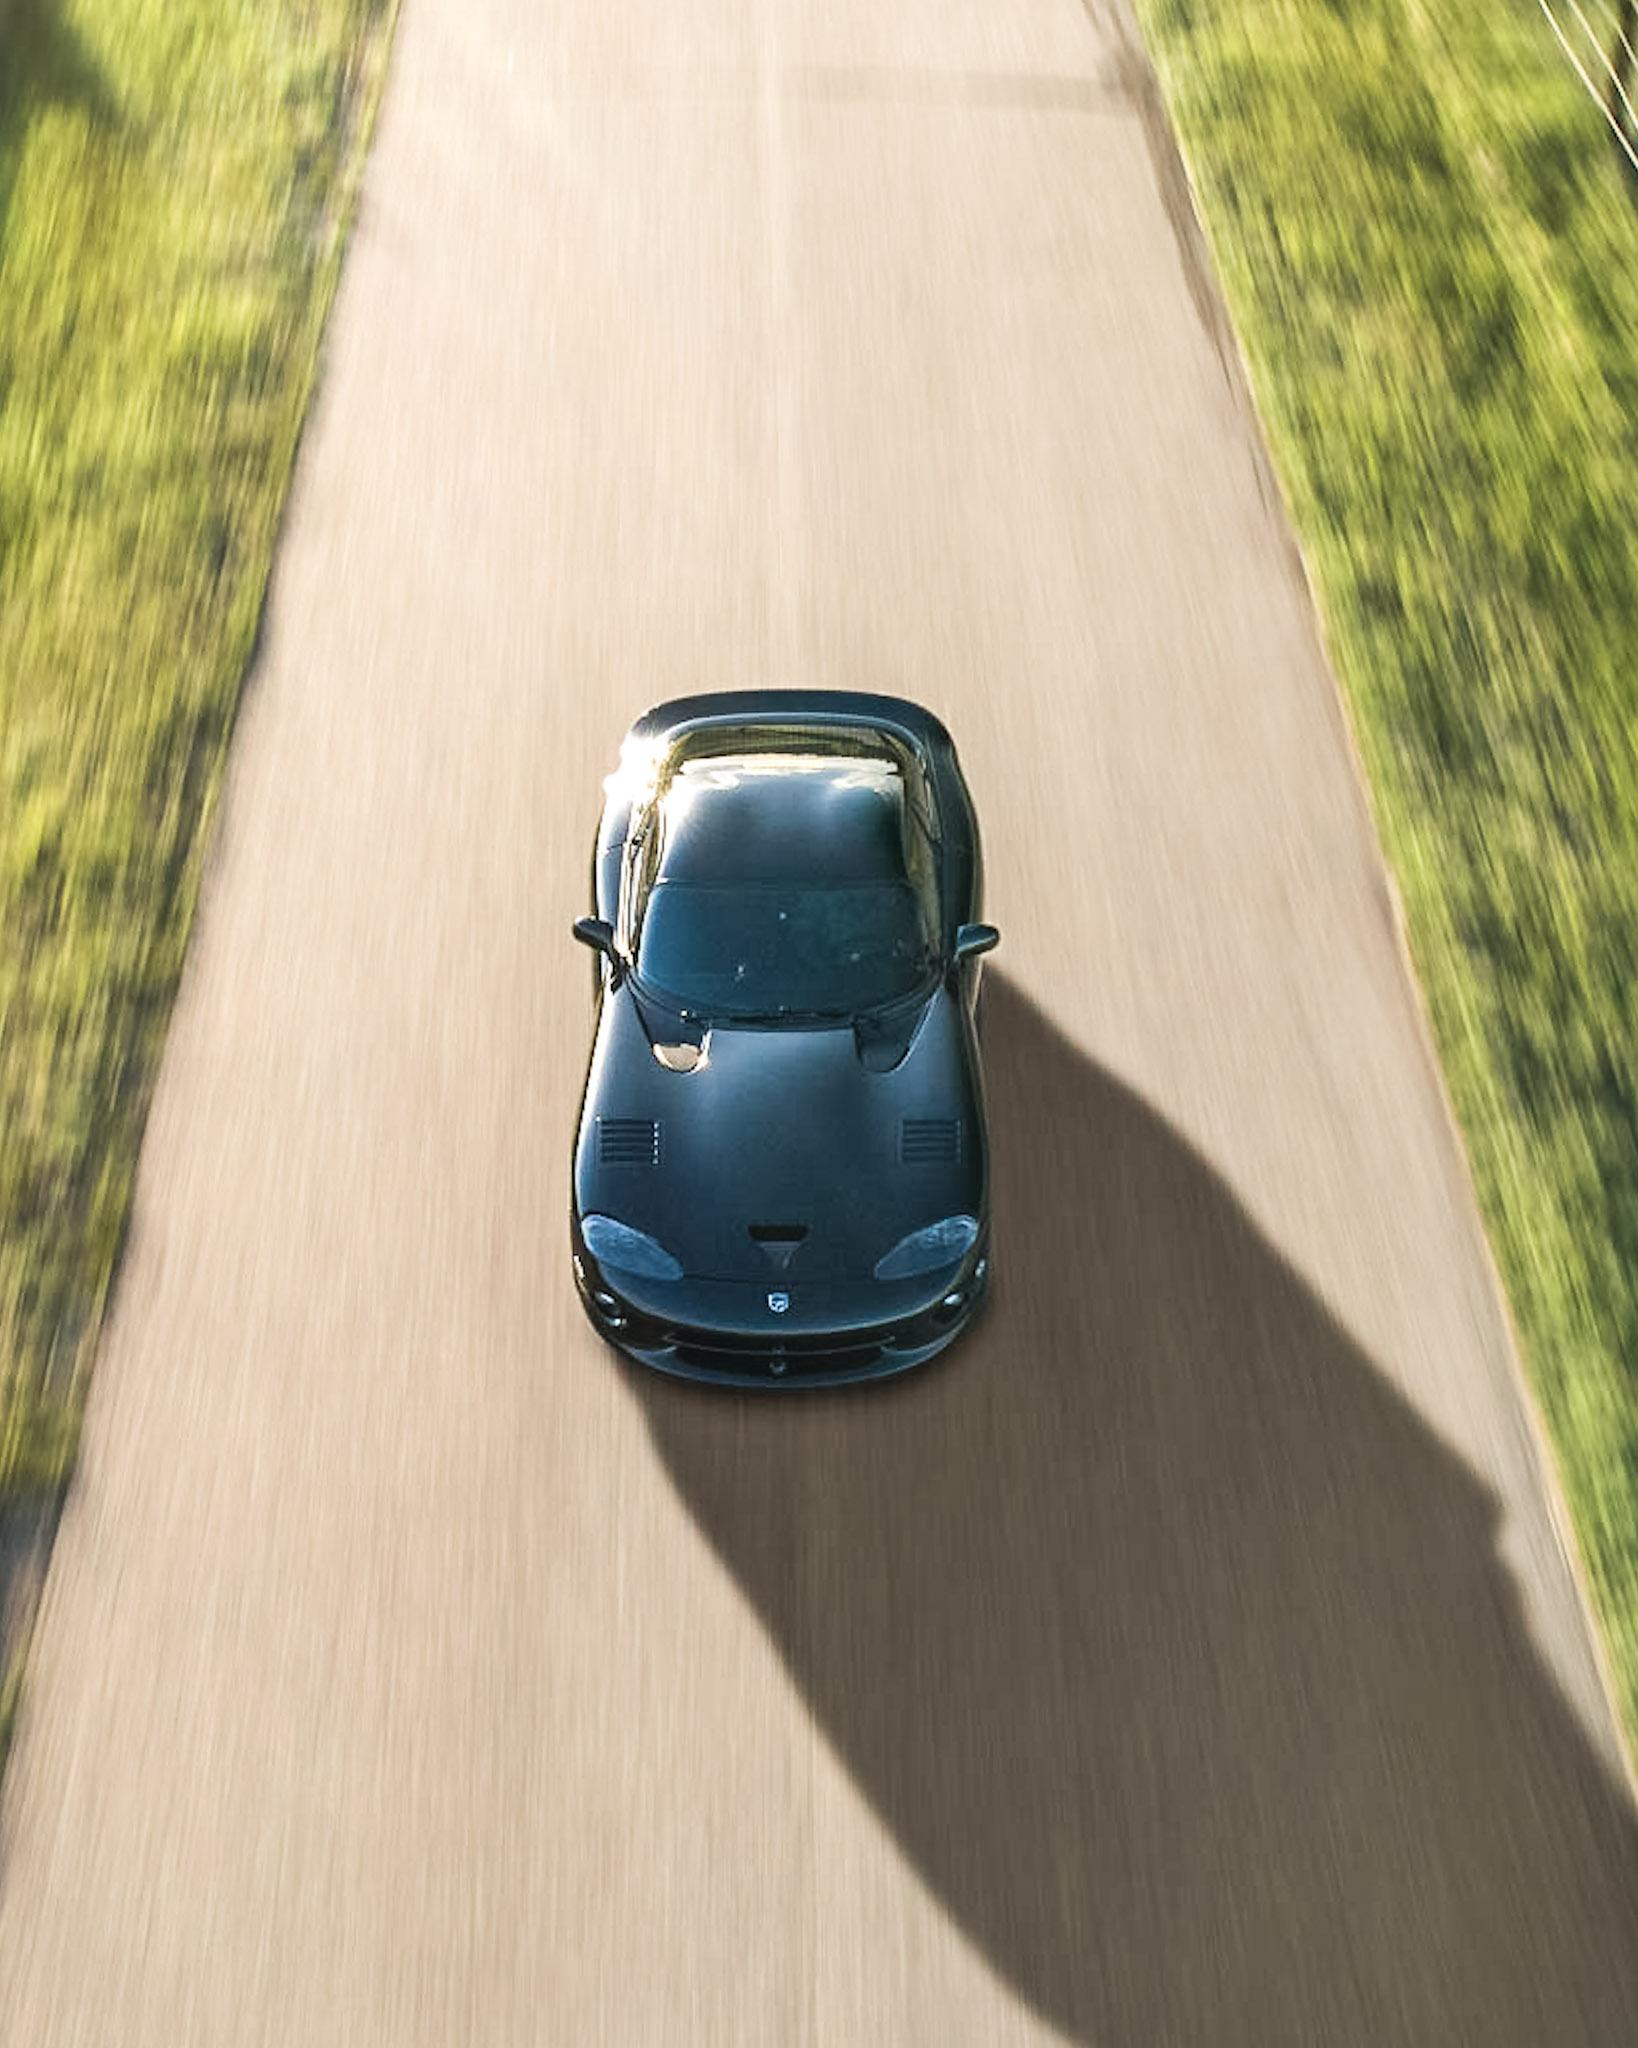 Viper GTS aerial automotive photography brian laiche